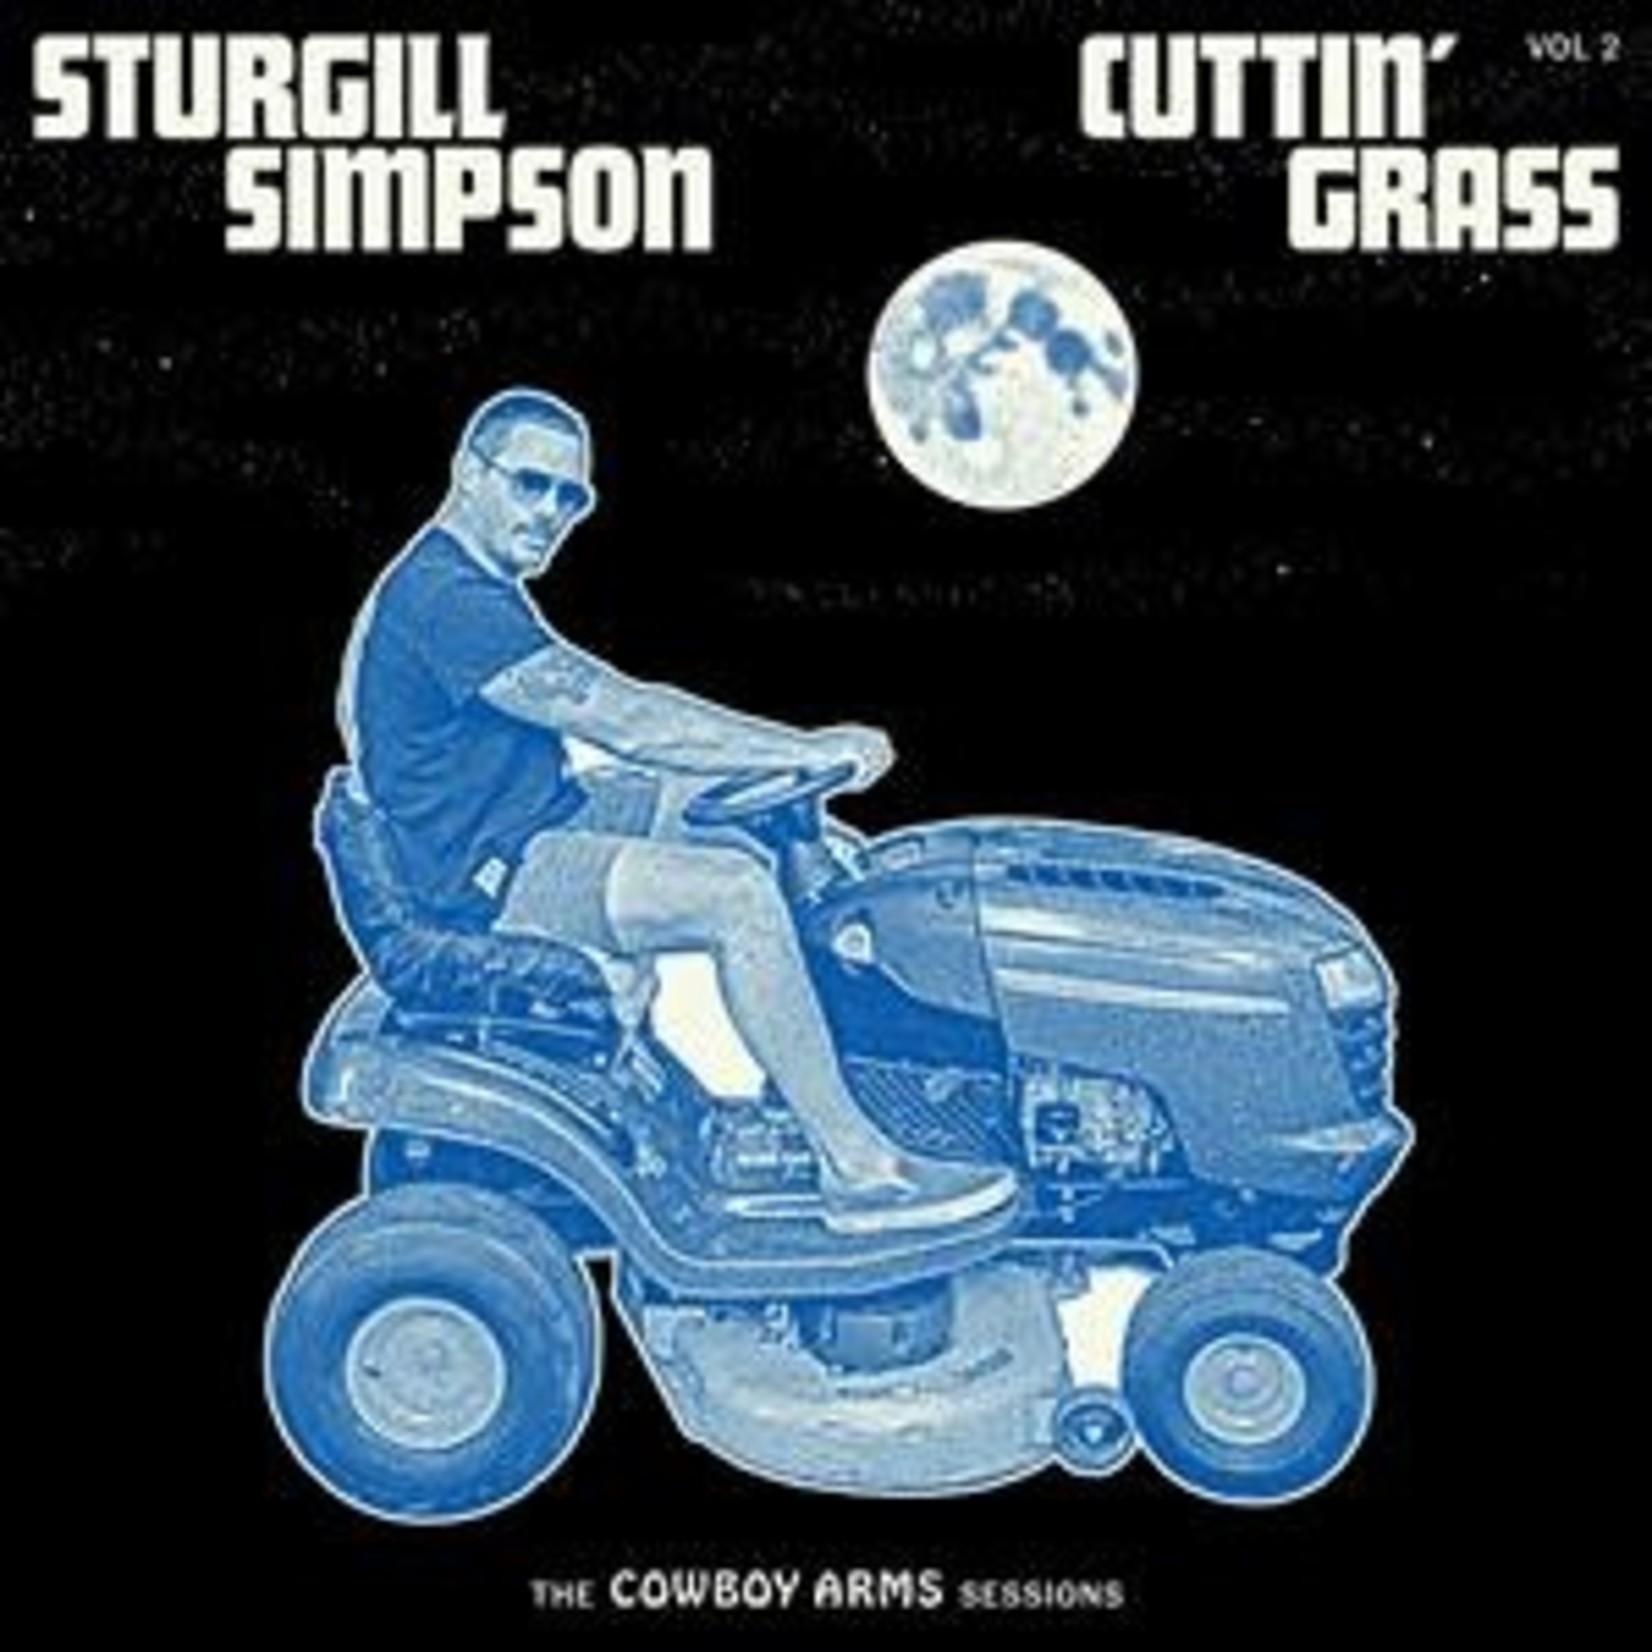 SIMPSON_ STURGILL - CUTTIN' GRASS - VOL.2.. (VINYL)